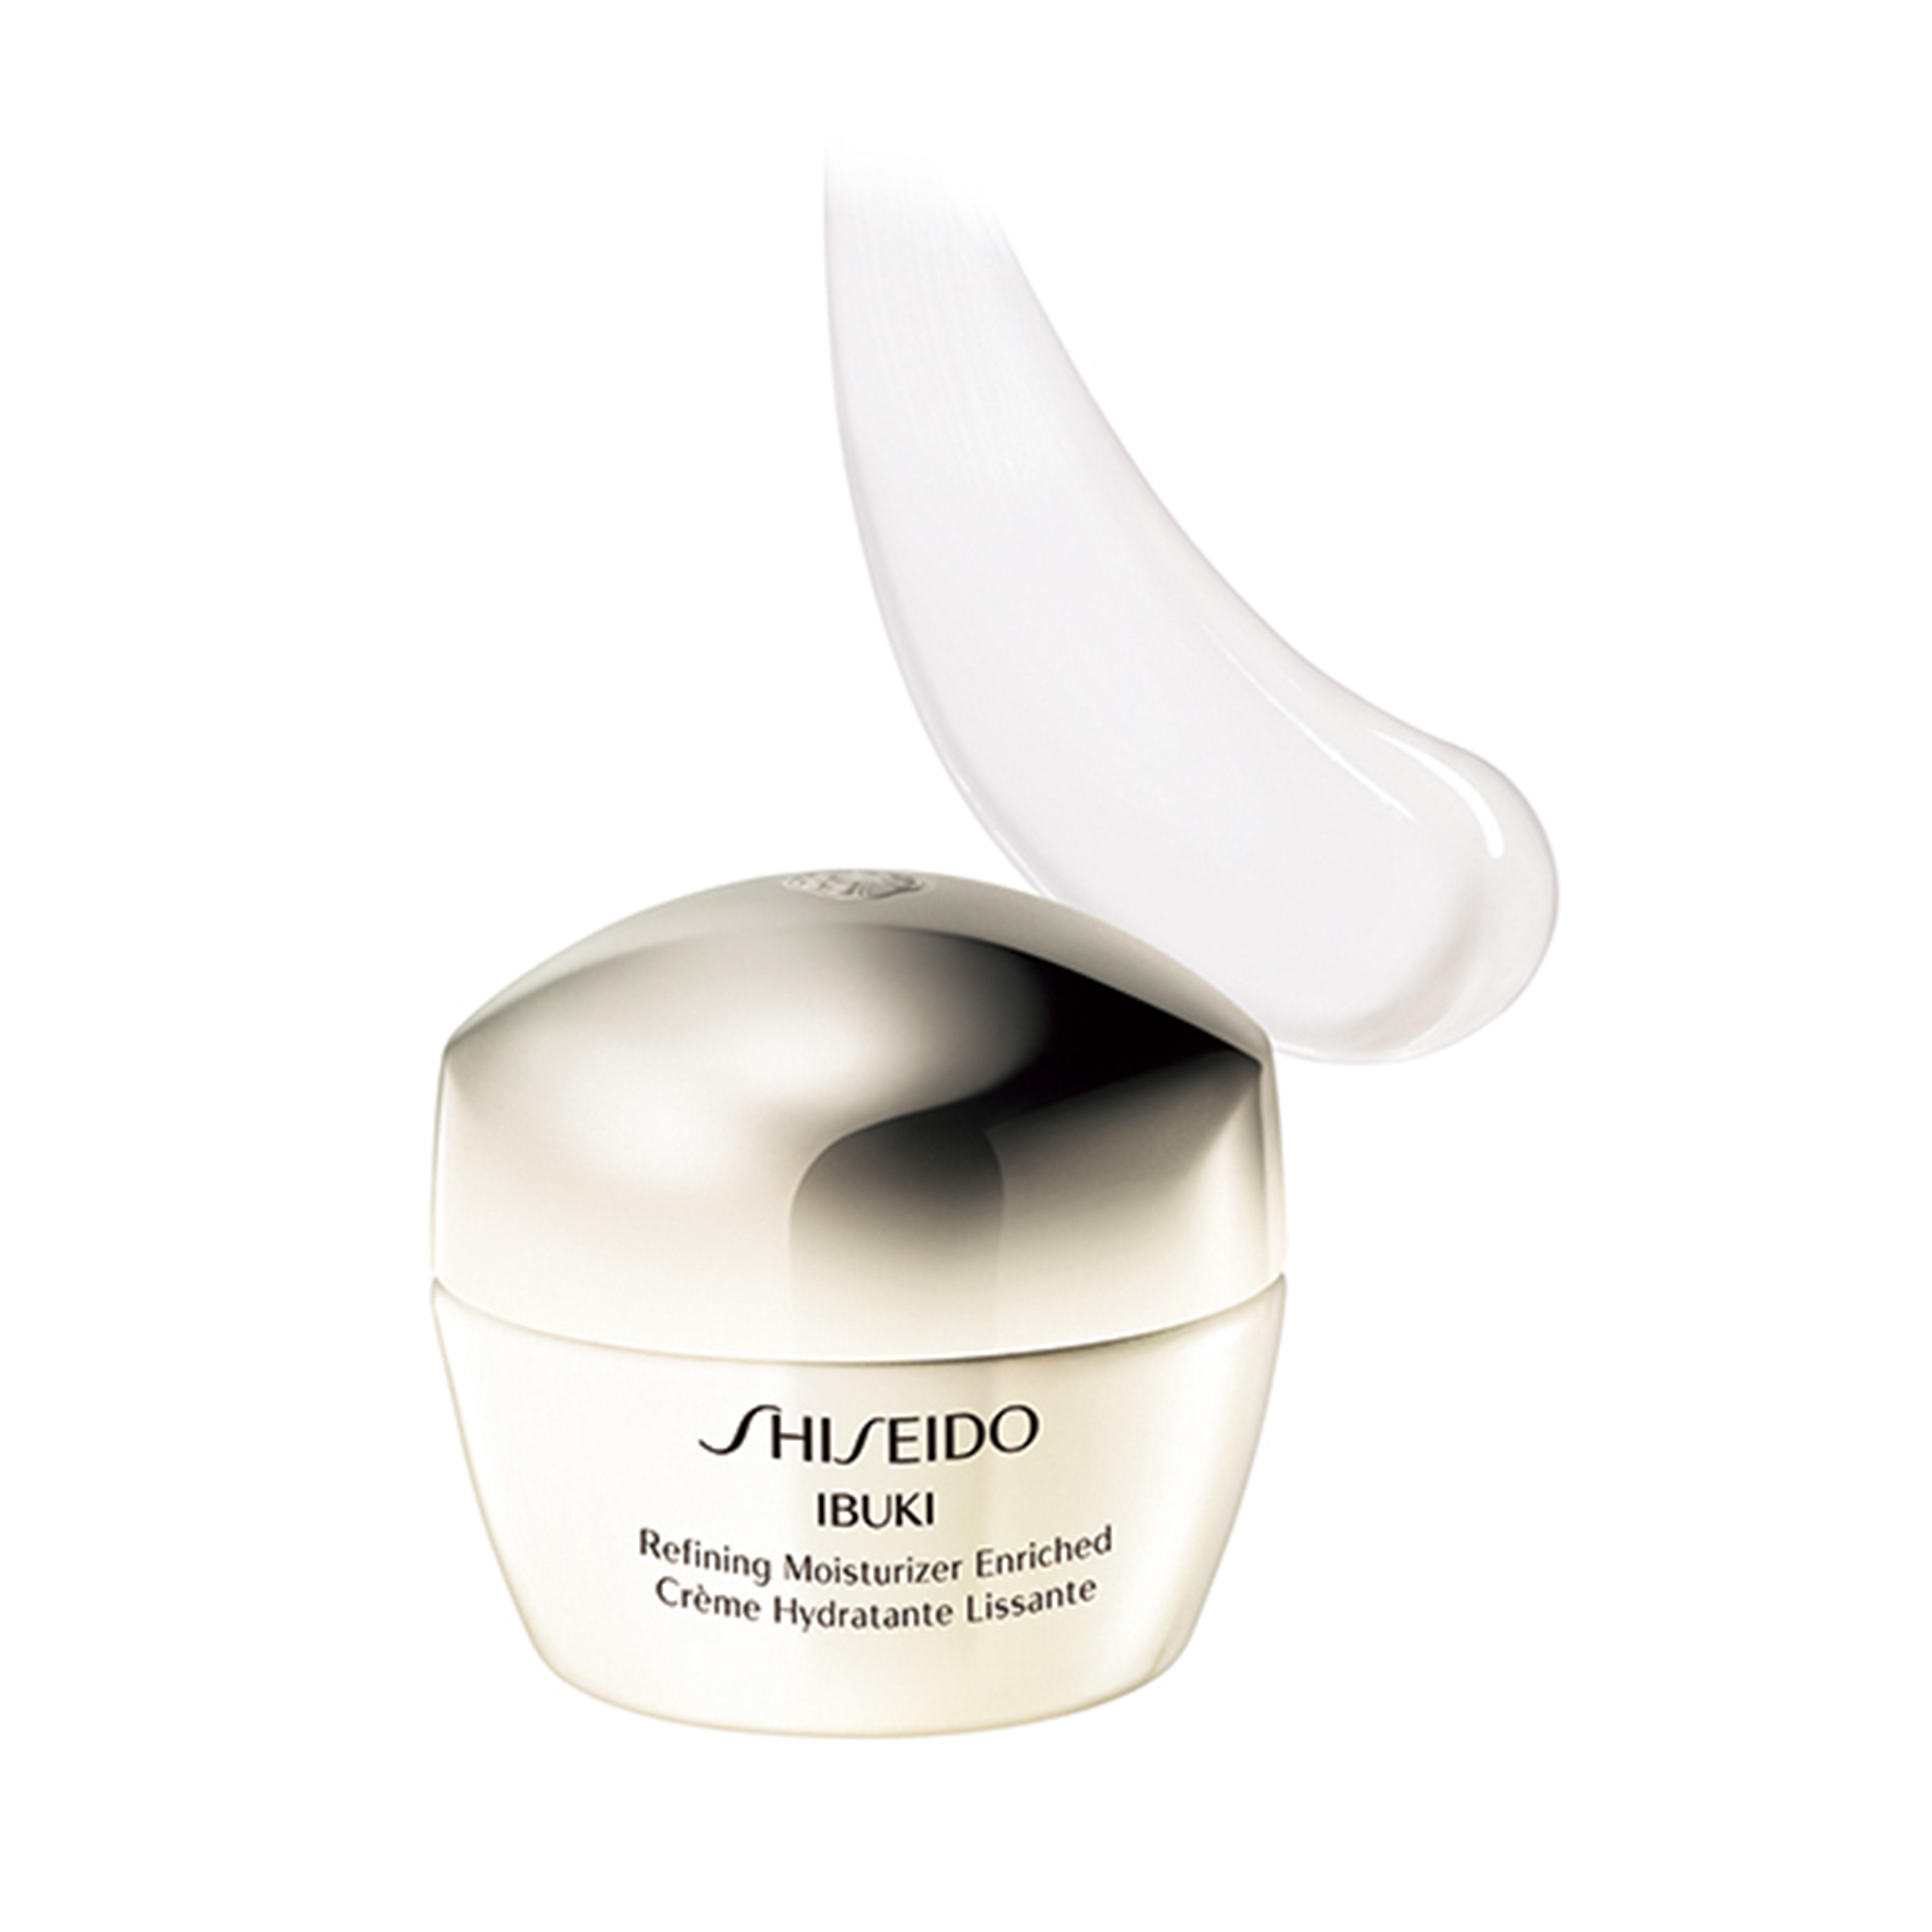 Shiseido Ibuki Refining Moisturizer, 75 ml